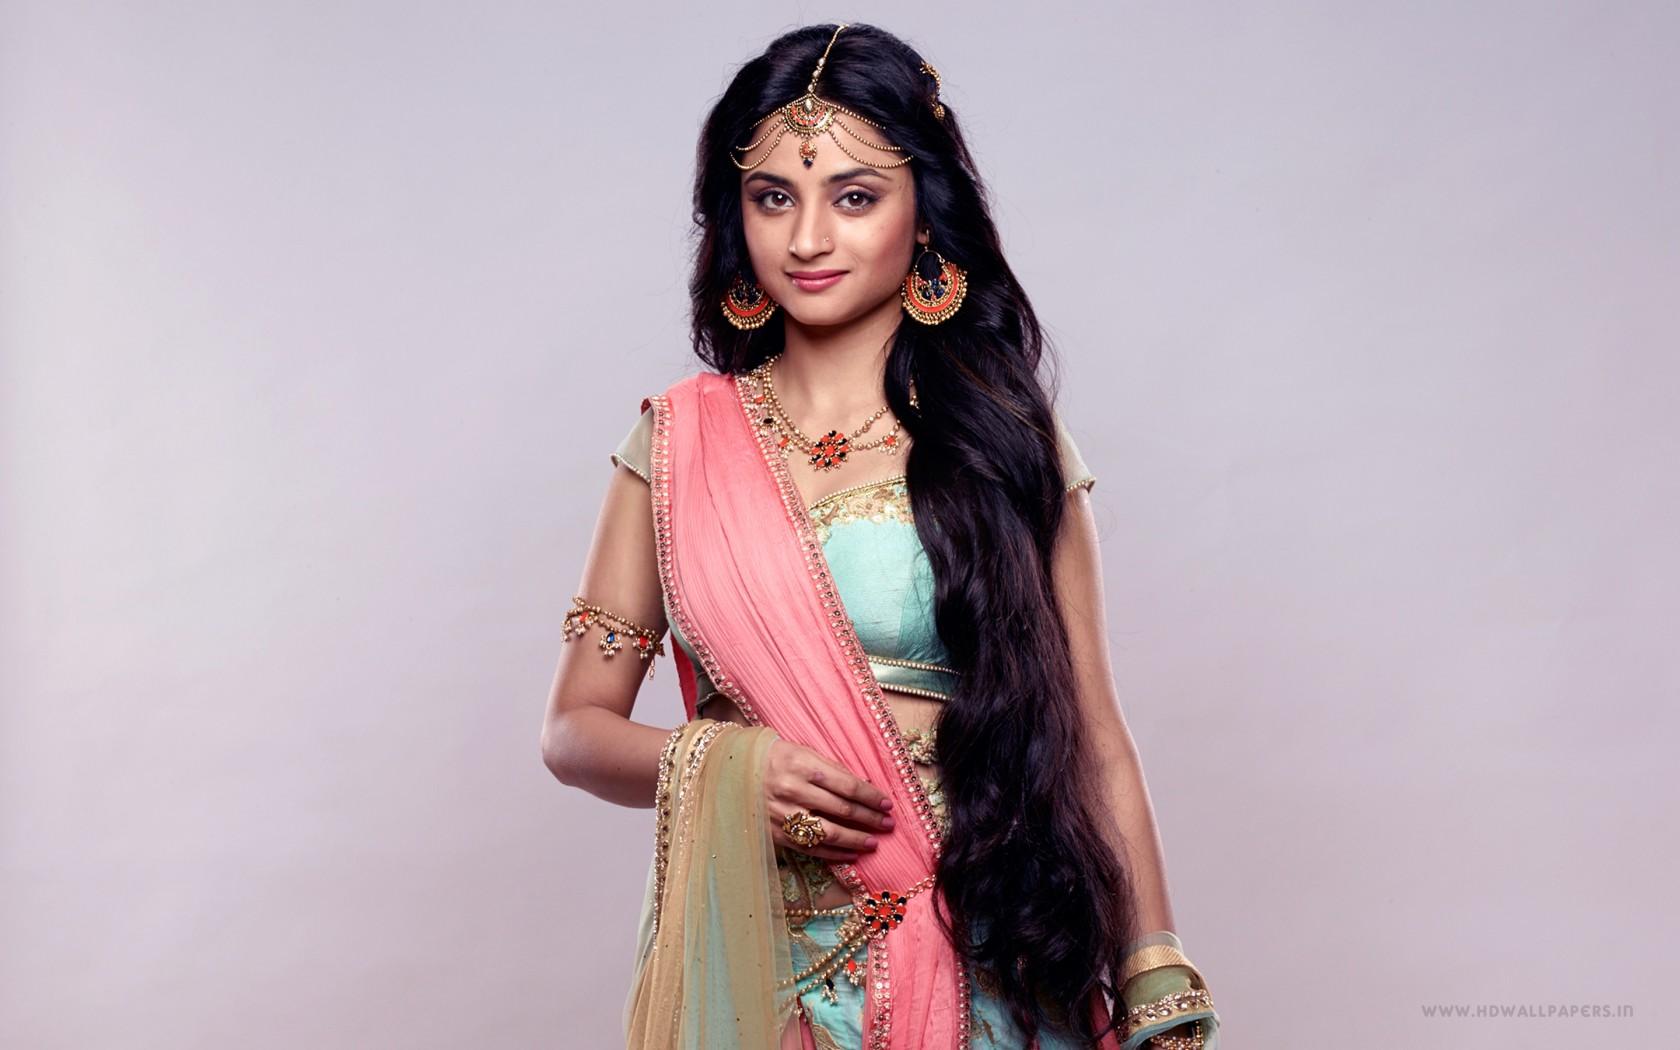 Cute Indian Girl Pictures Wallpapers Sita Madirakshi Siya Ke Ram Star Plus Wallpapers Hd